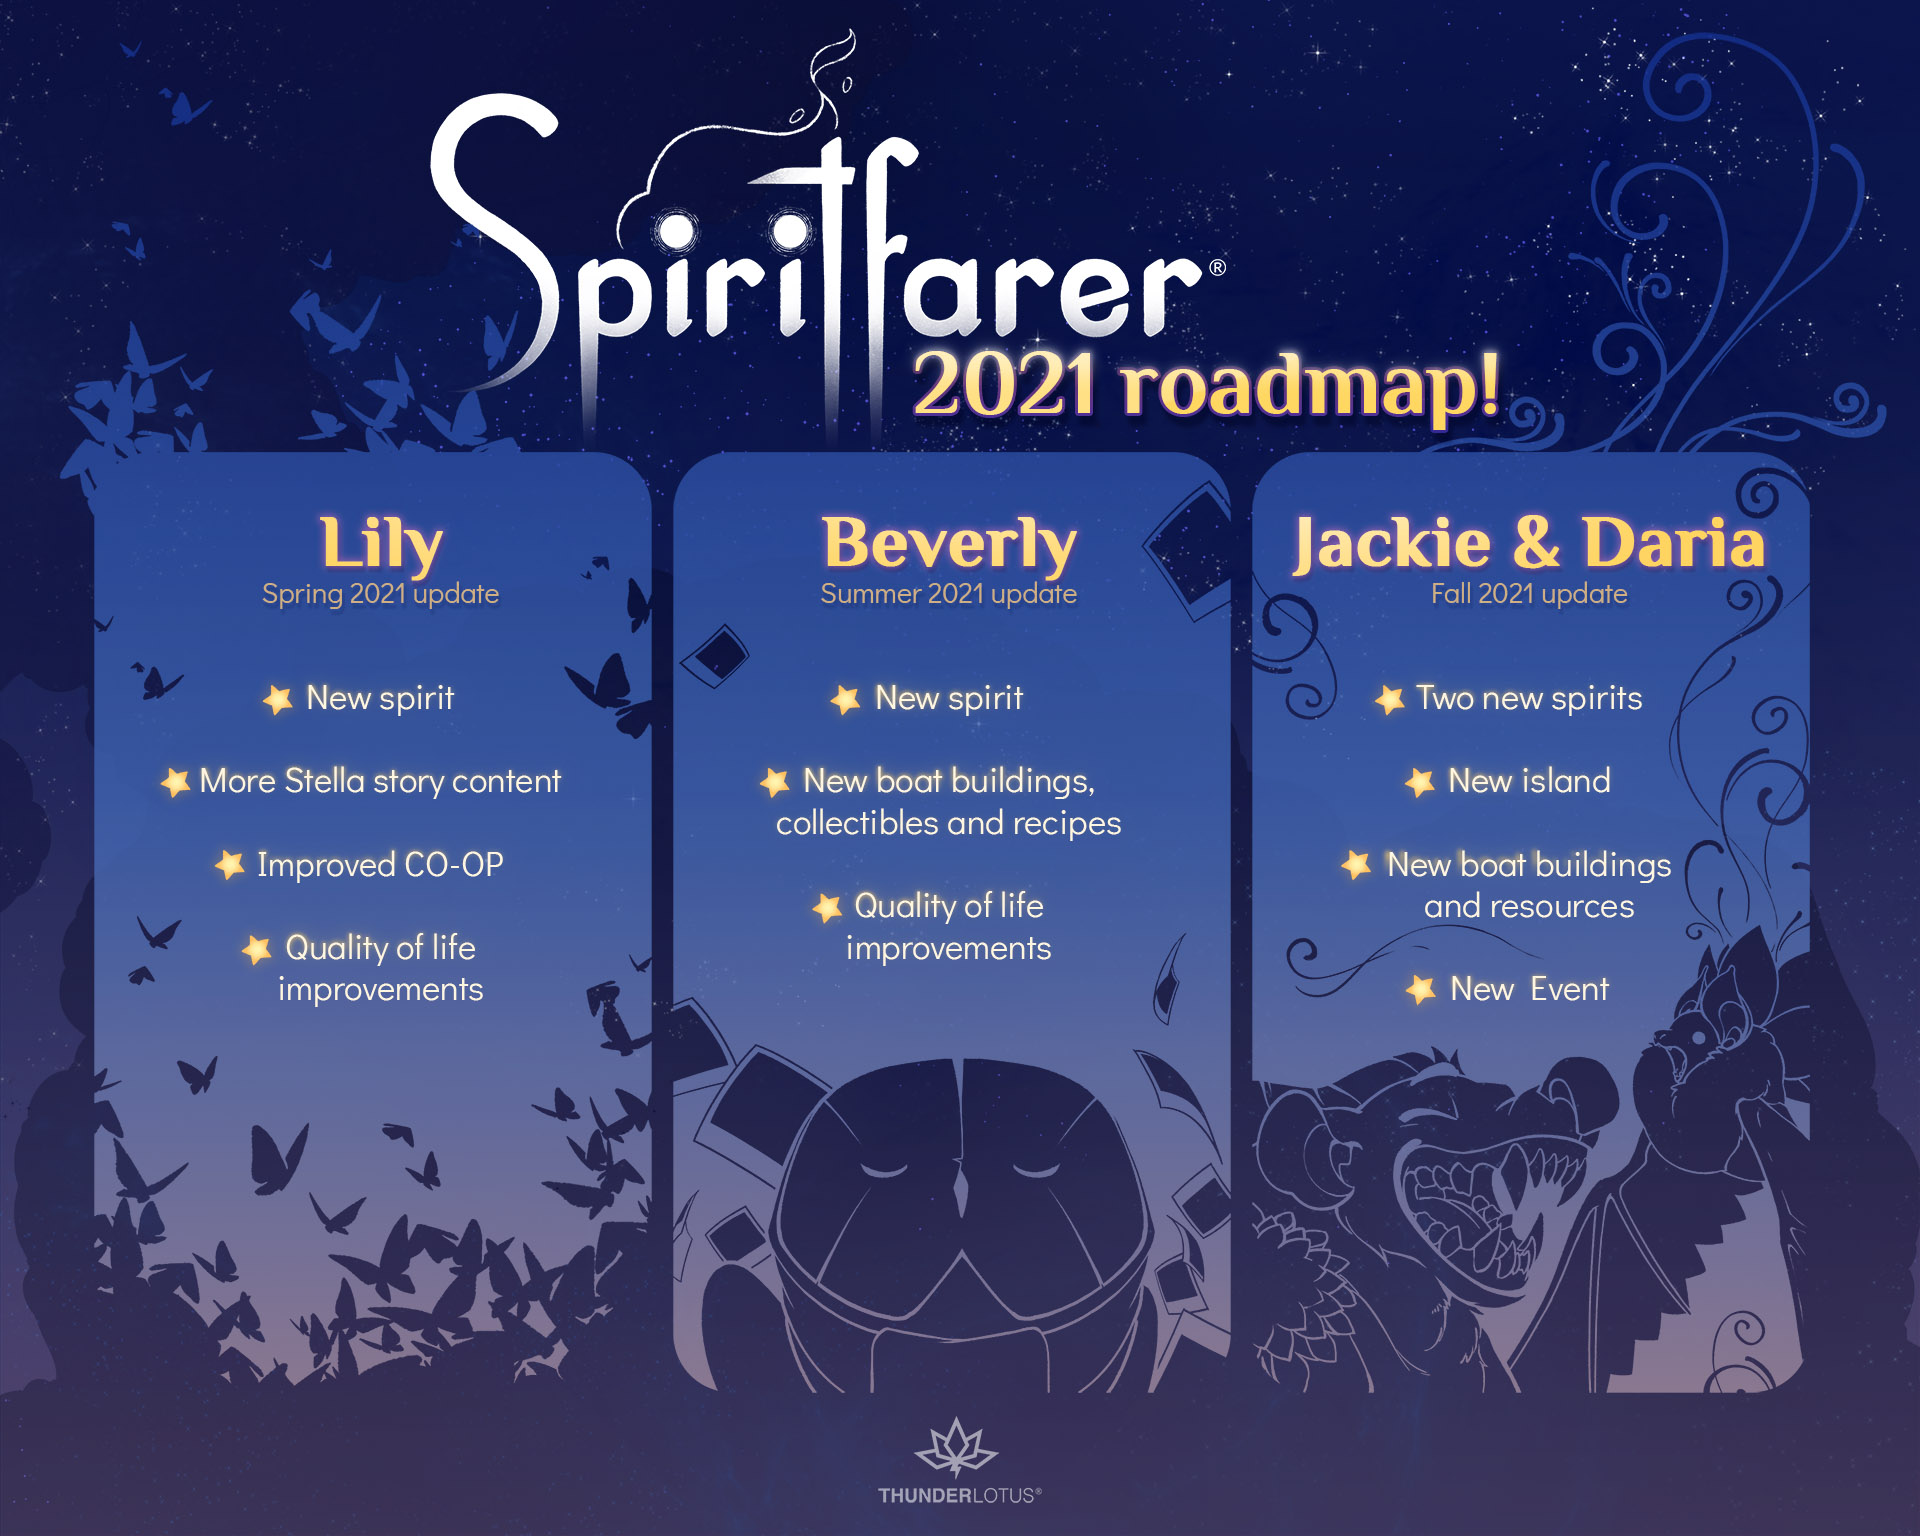 Spiritfarer 2021 roadmap